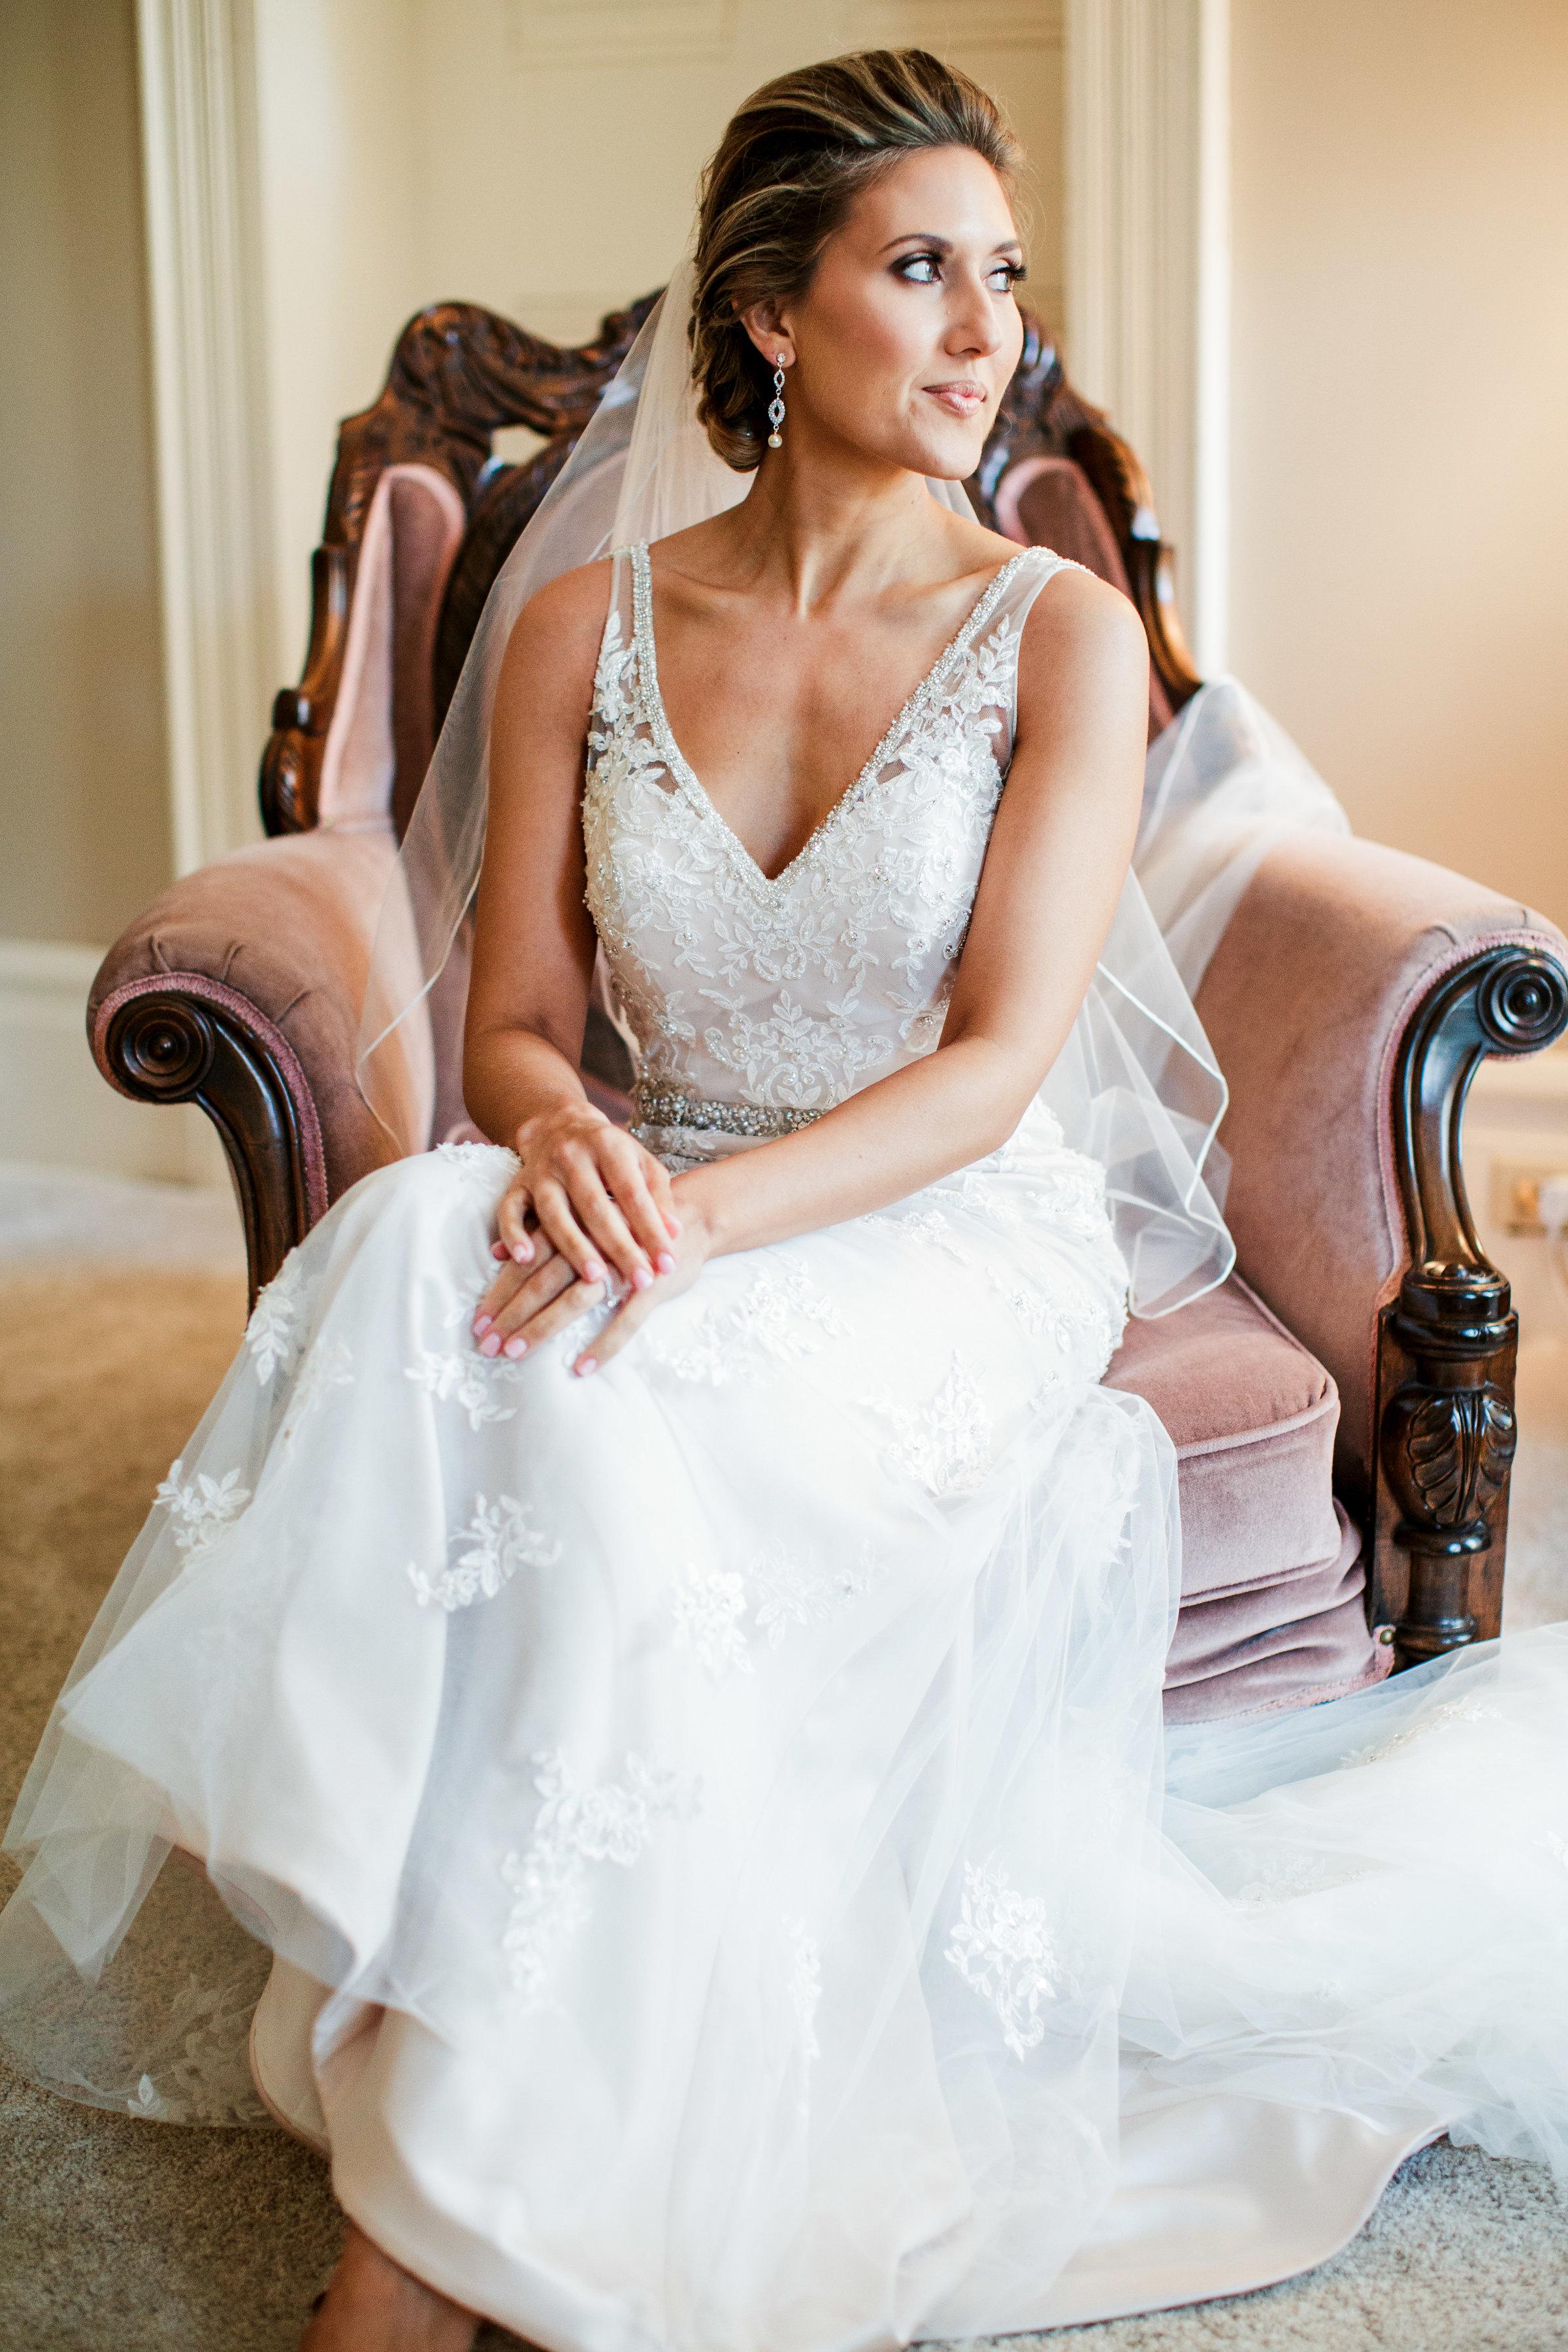 Riverwood-Mansion-Wedding4.jpg